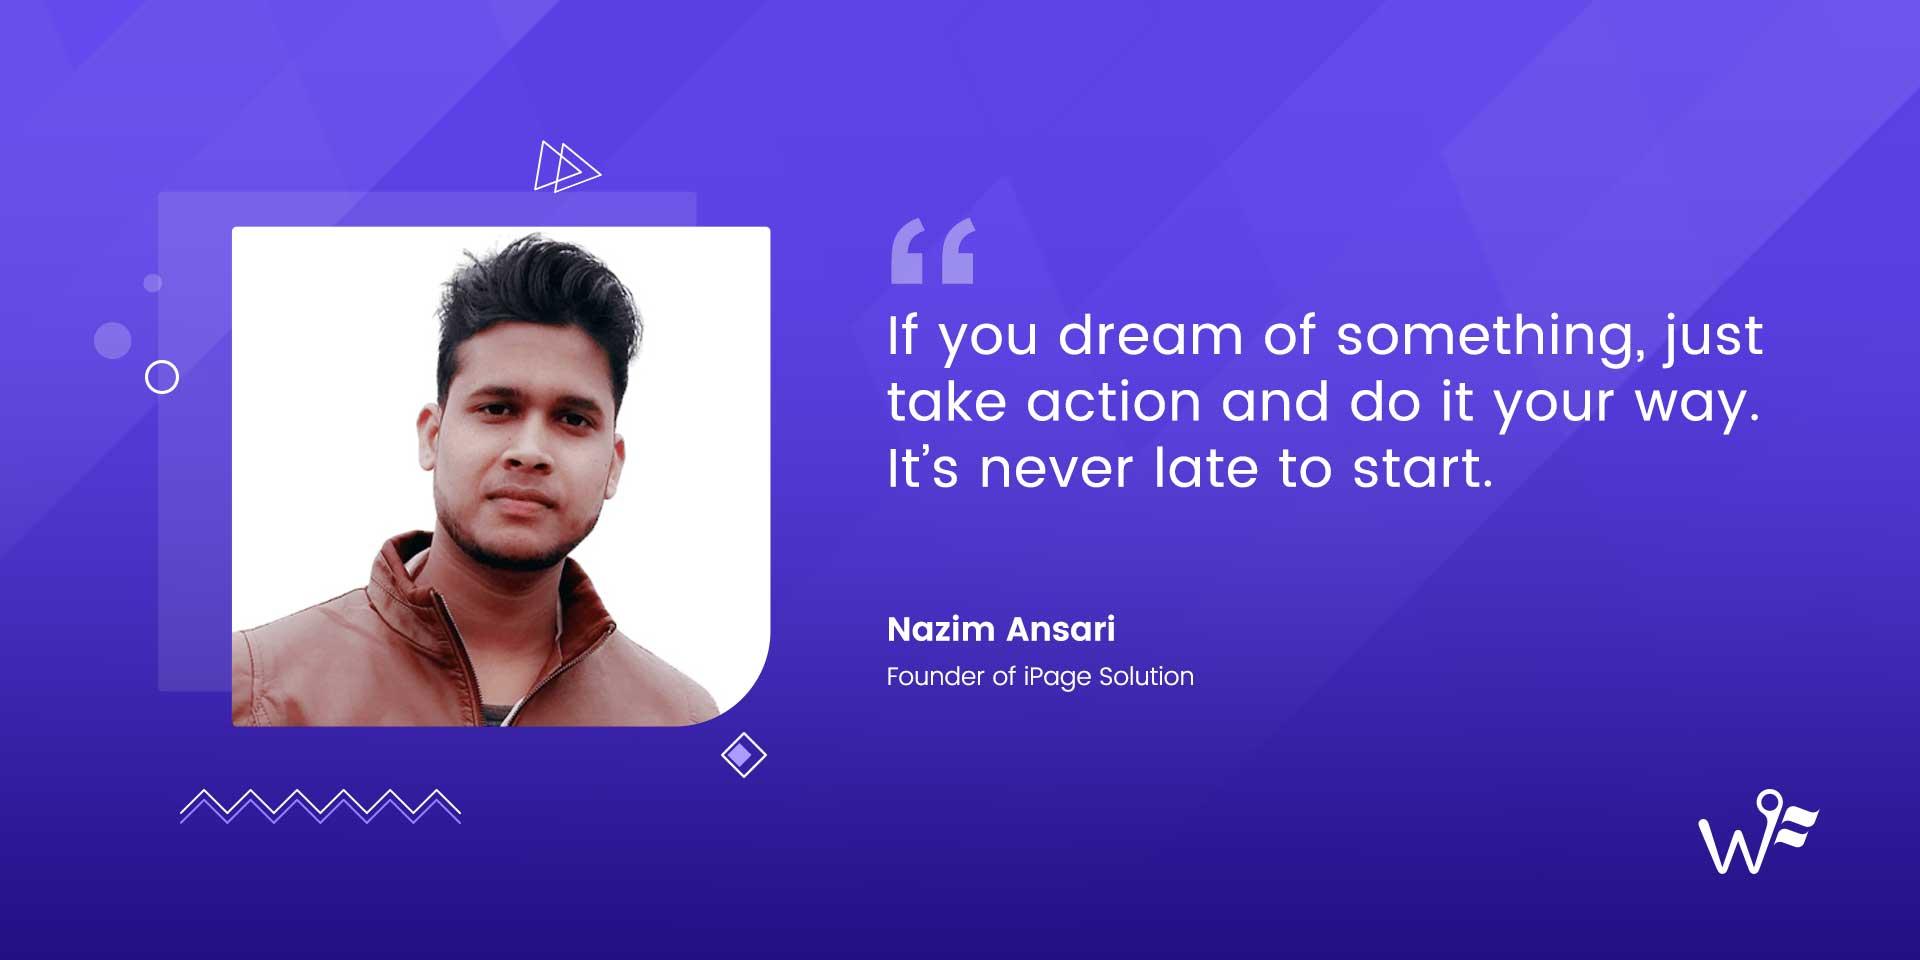 Nazim Ansari of iPage Solution